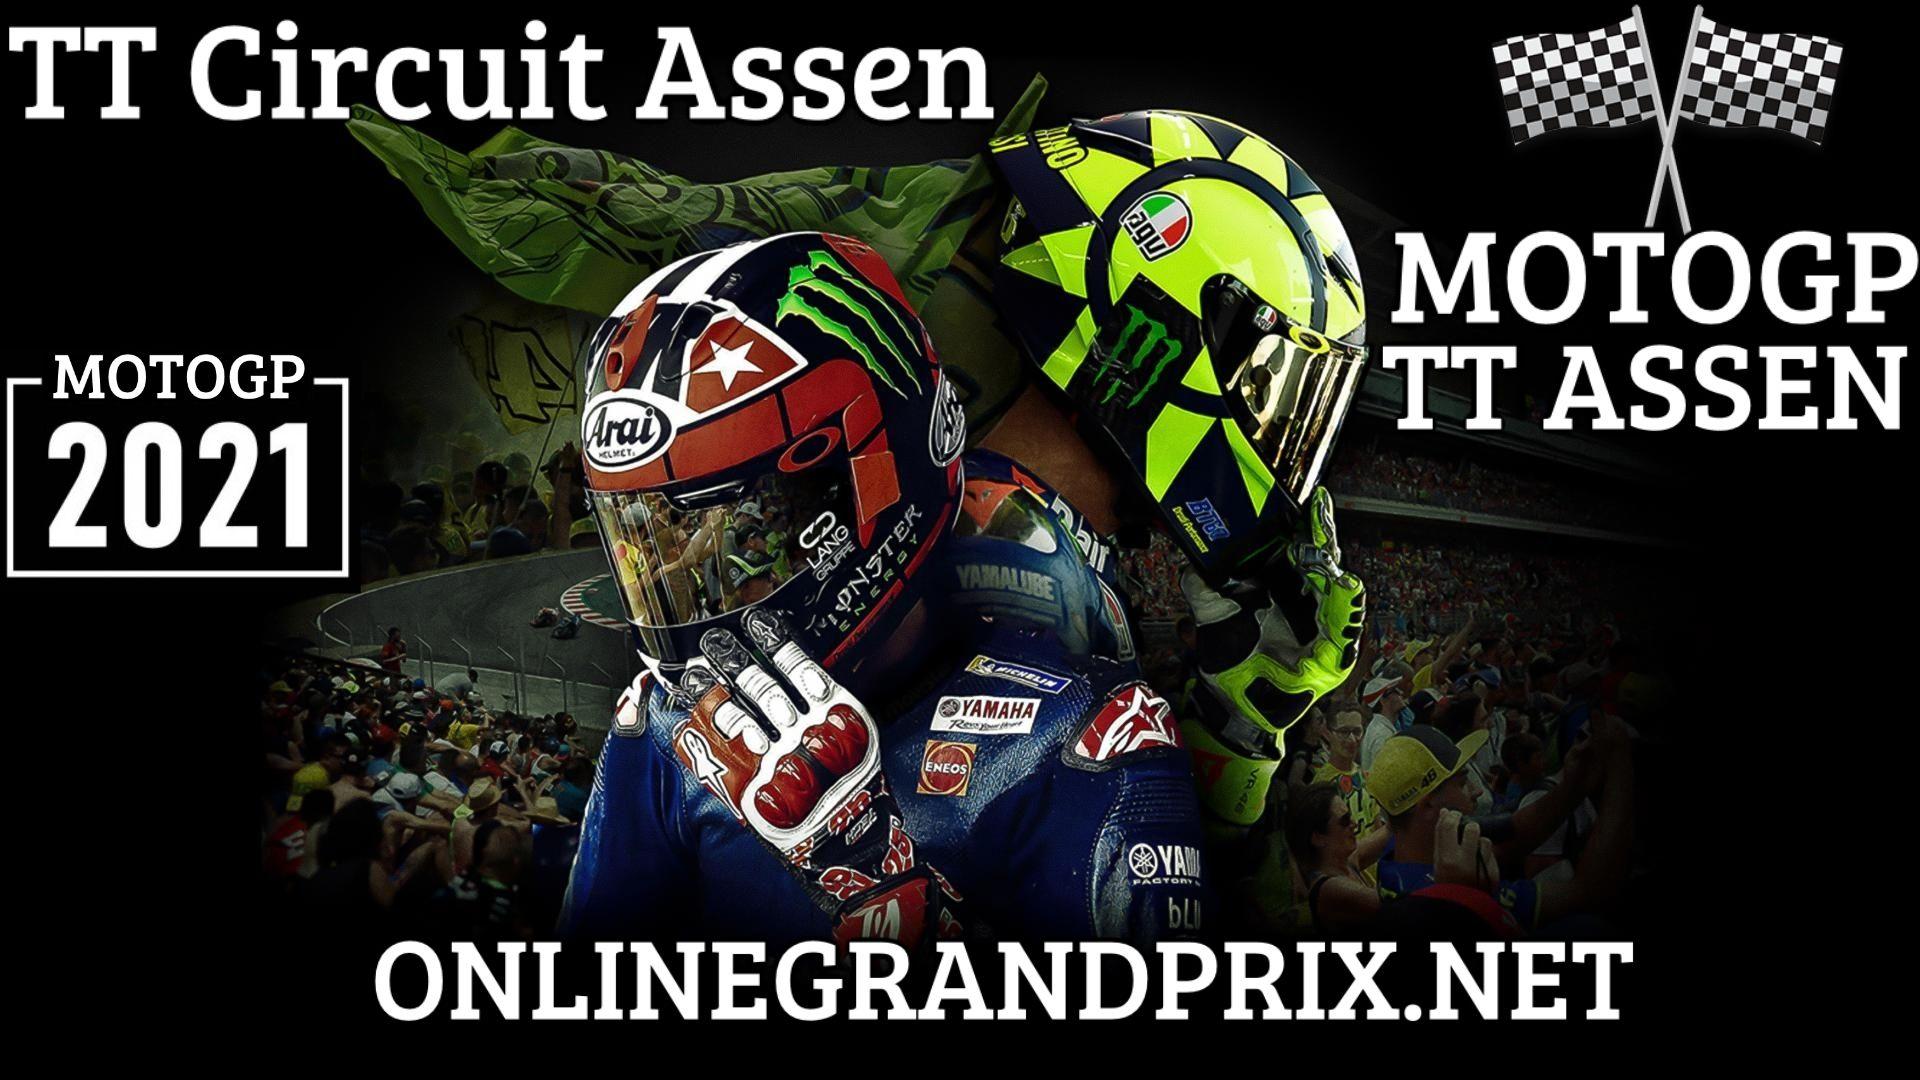 MotoGP TT Assen Grand Prix Live Stream